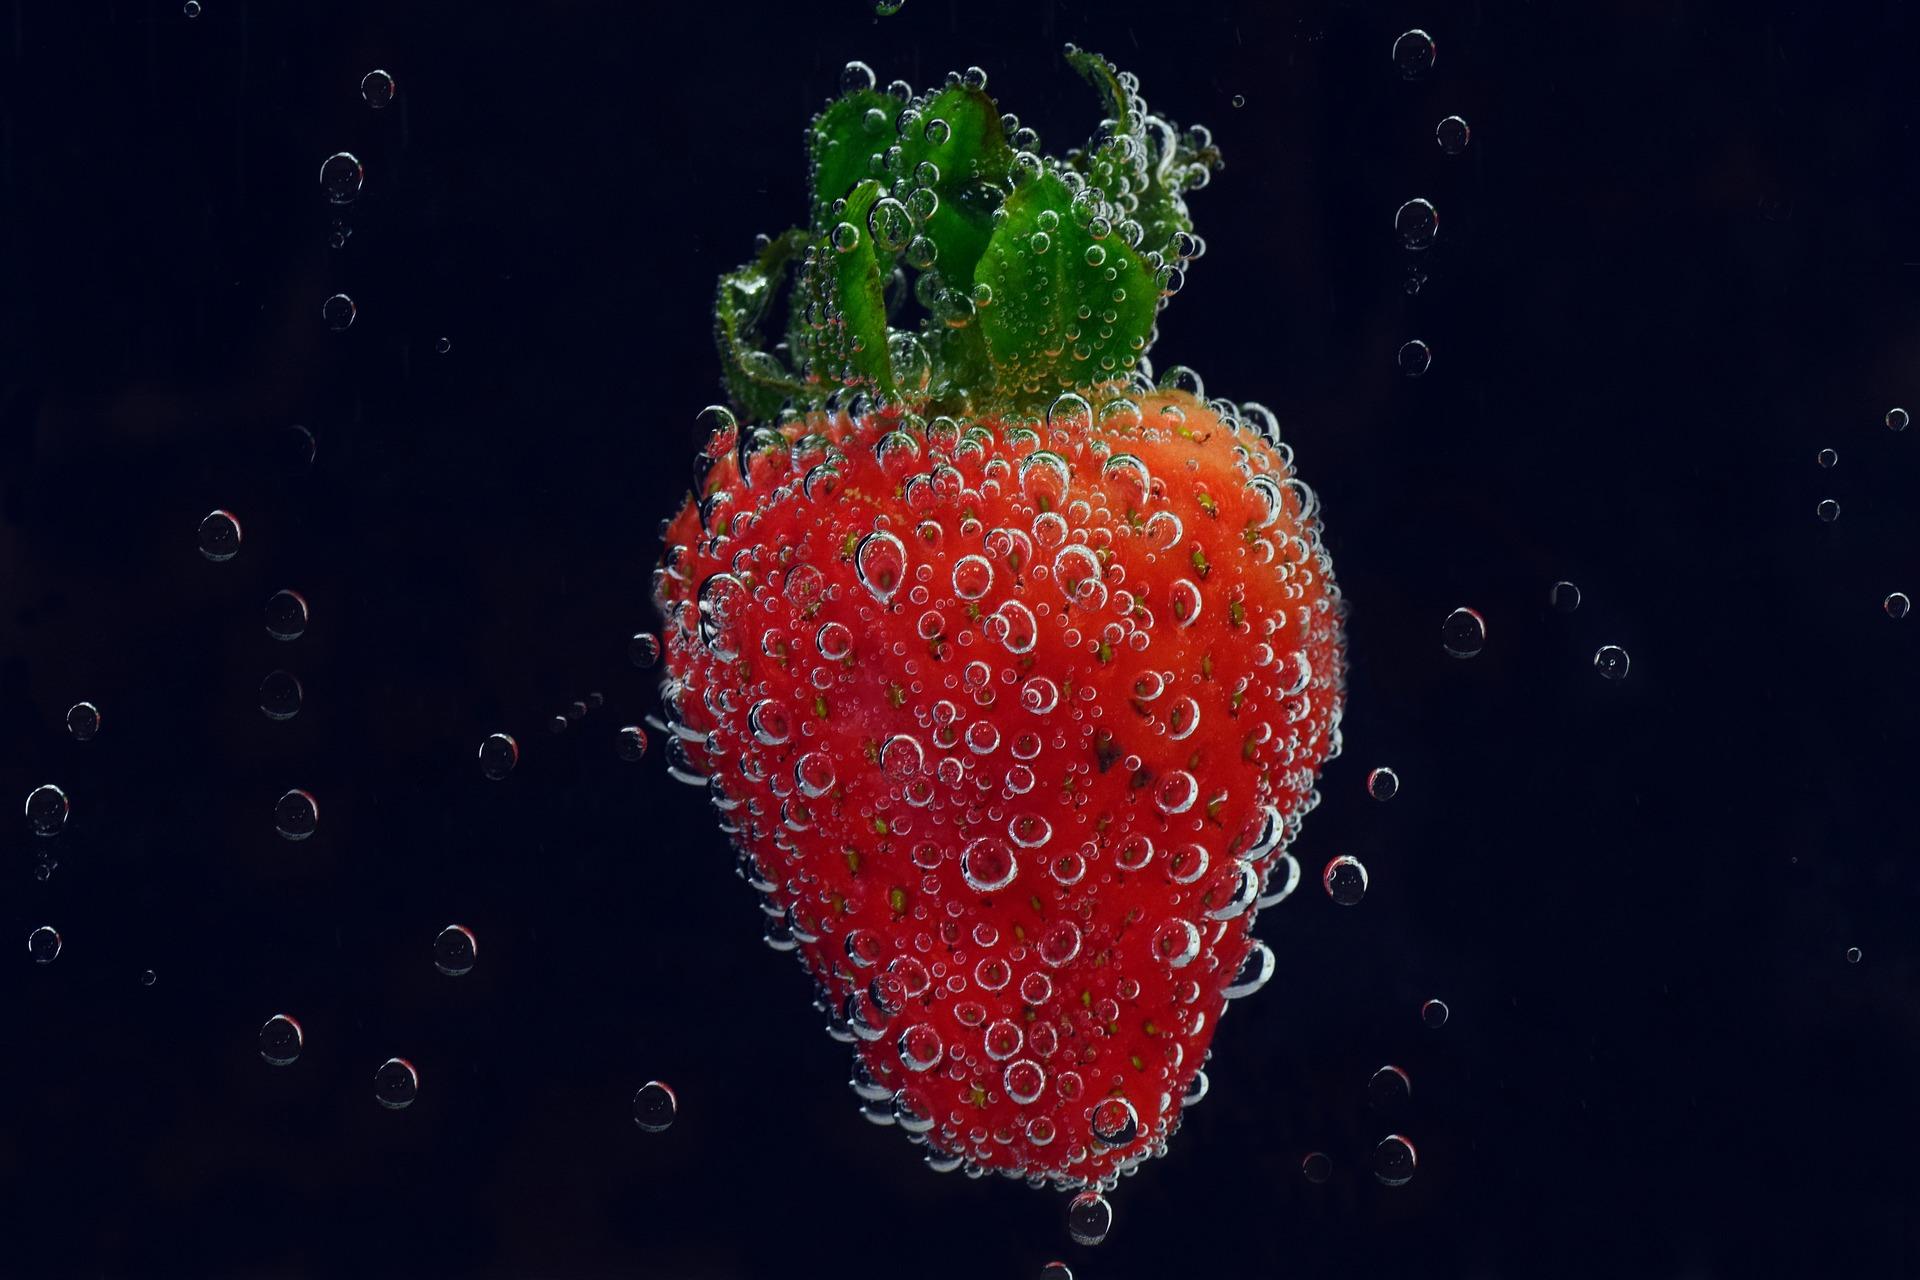 strawberry-3317983_1920